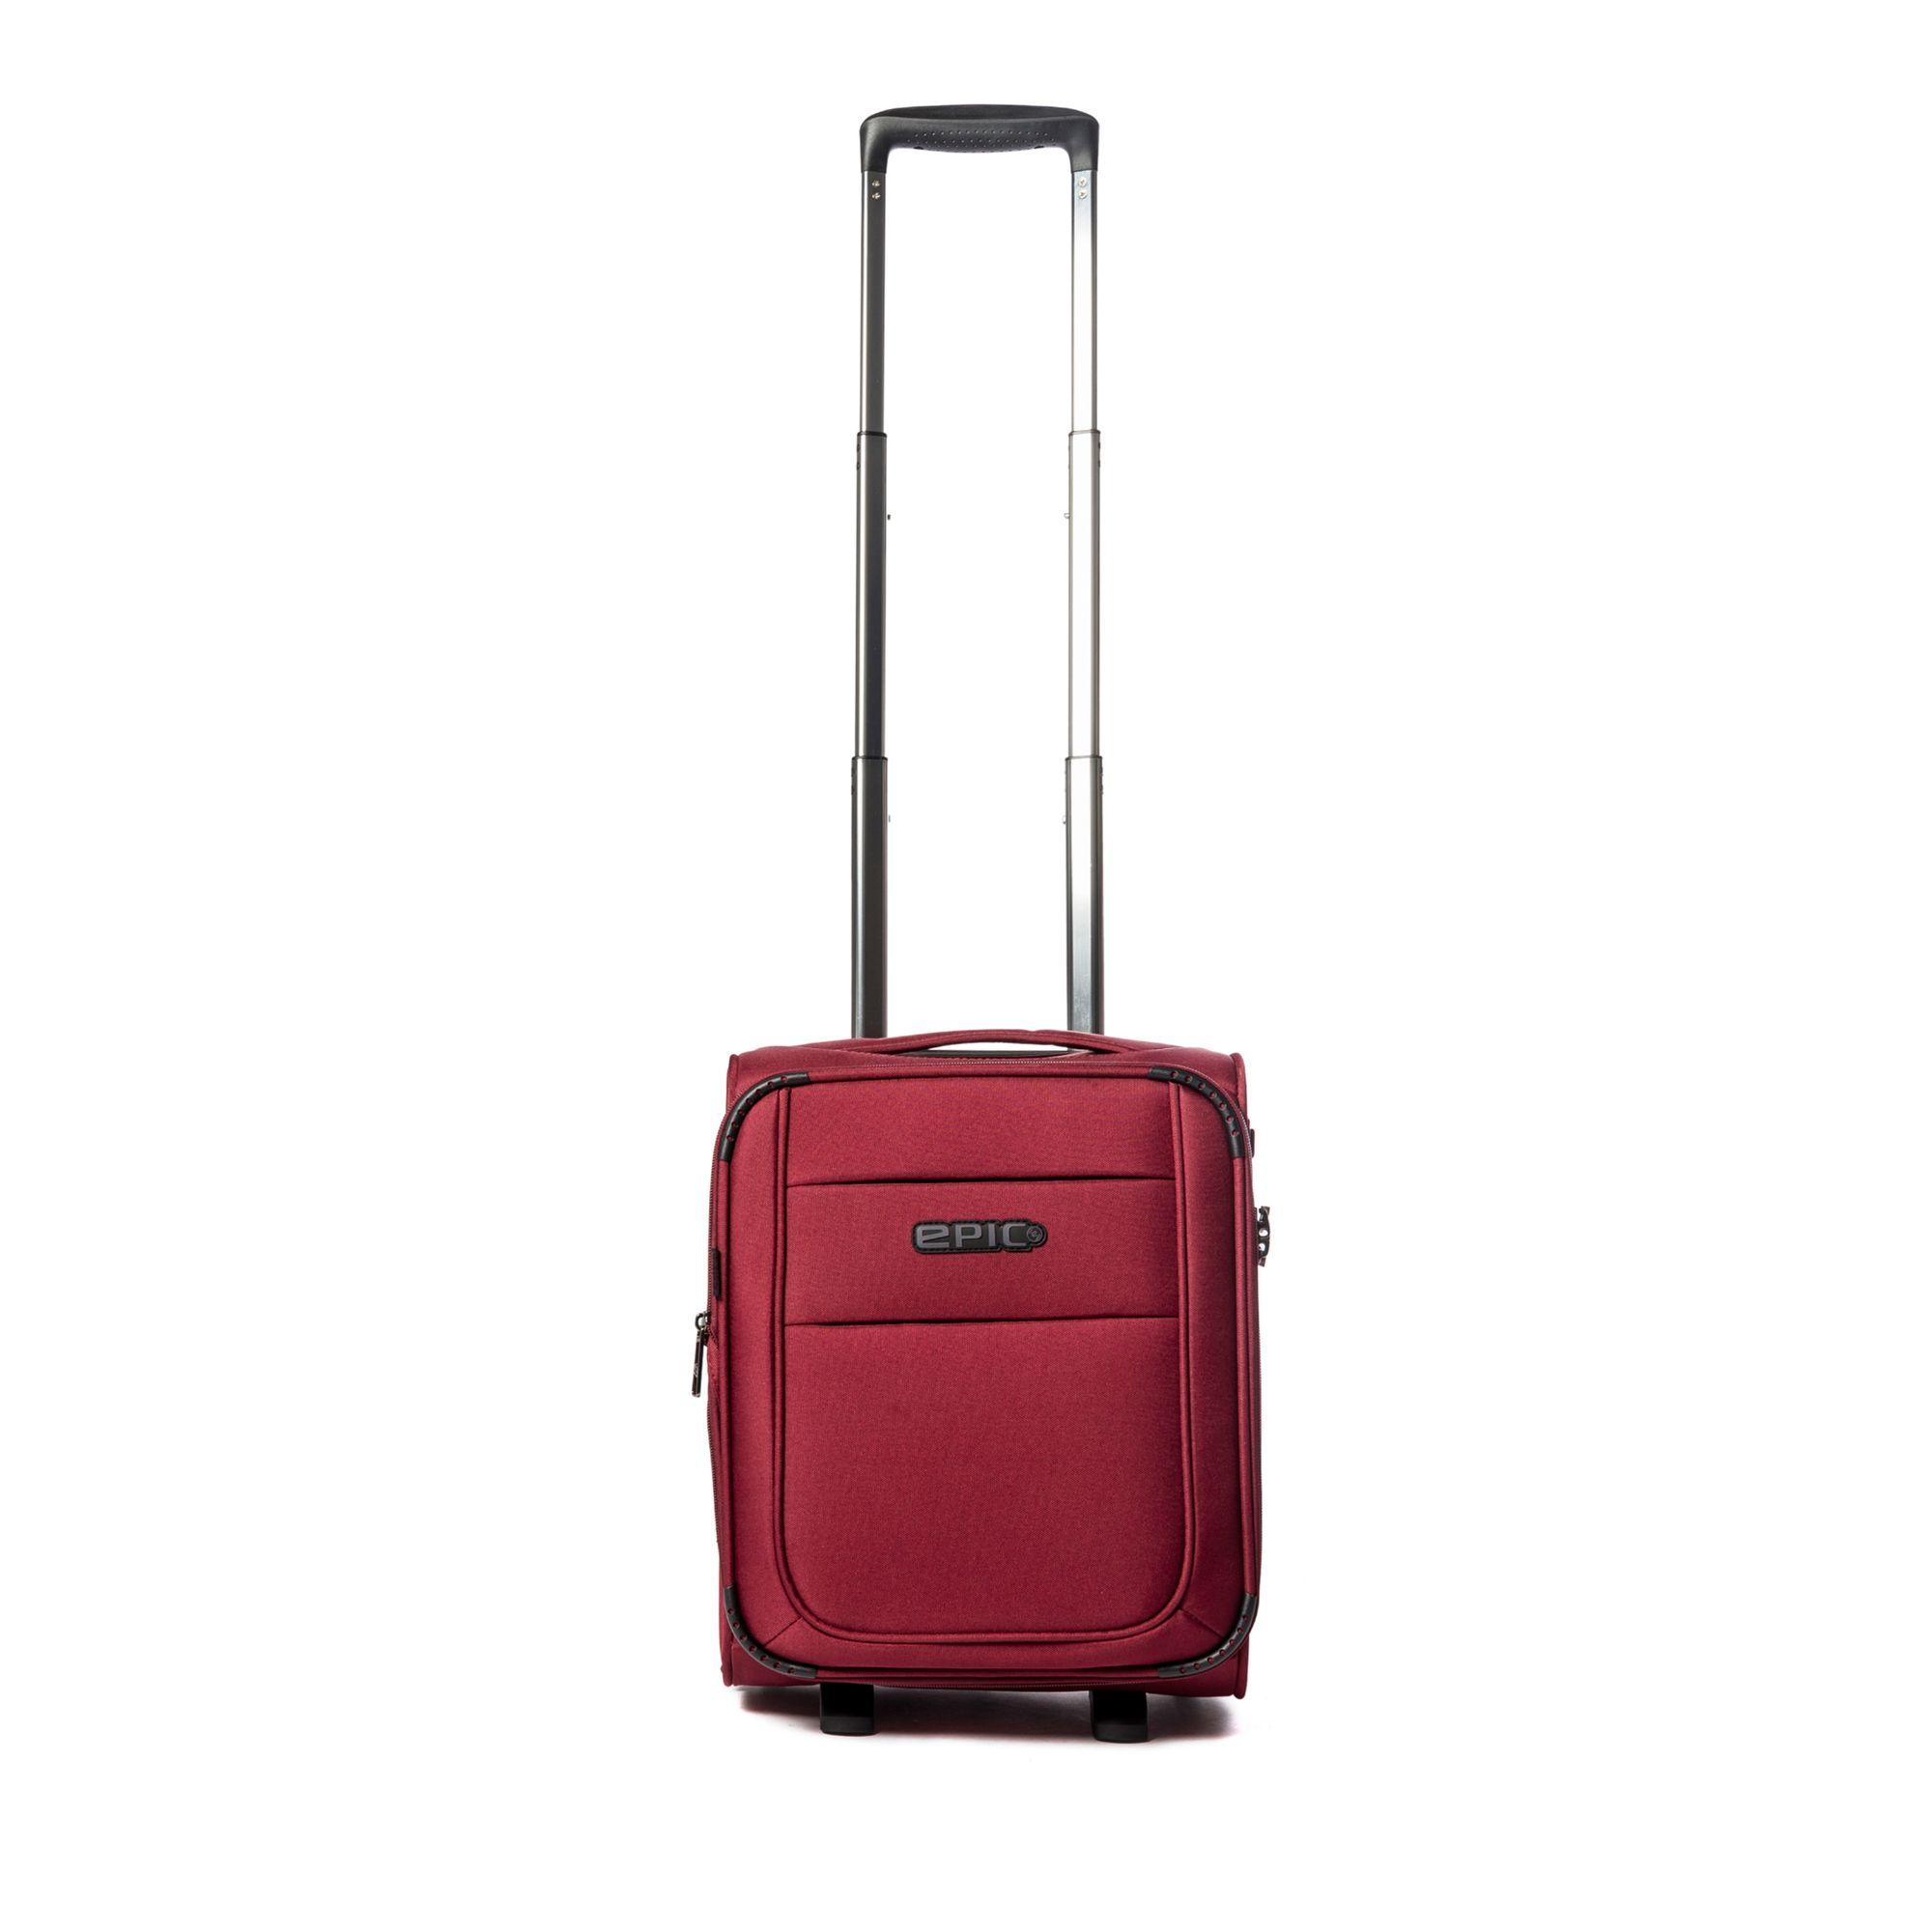 Epic Discovery Ultra mjuk resväska, 2 hjul, 45 cm, Bordeaux